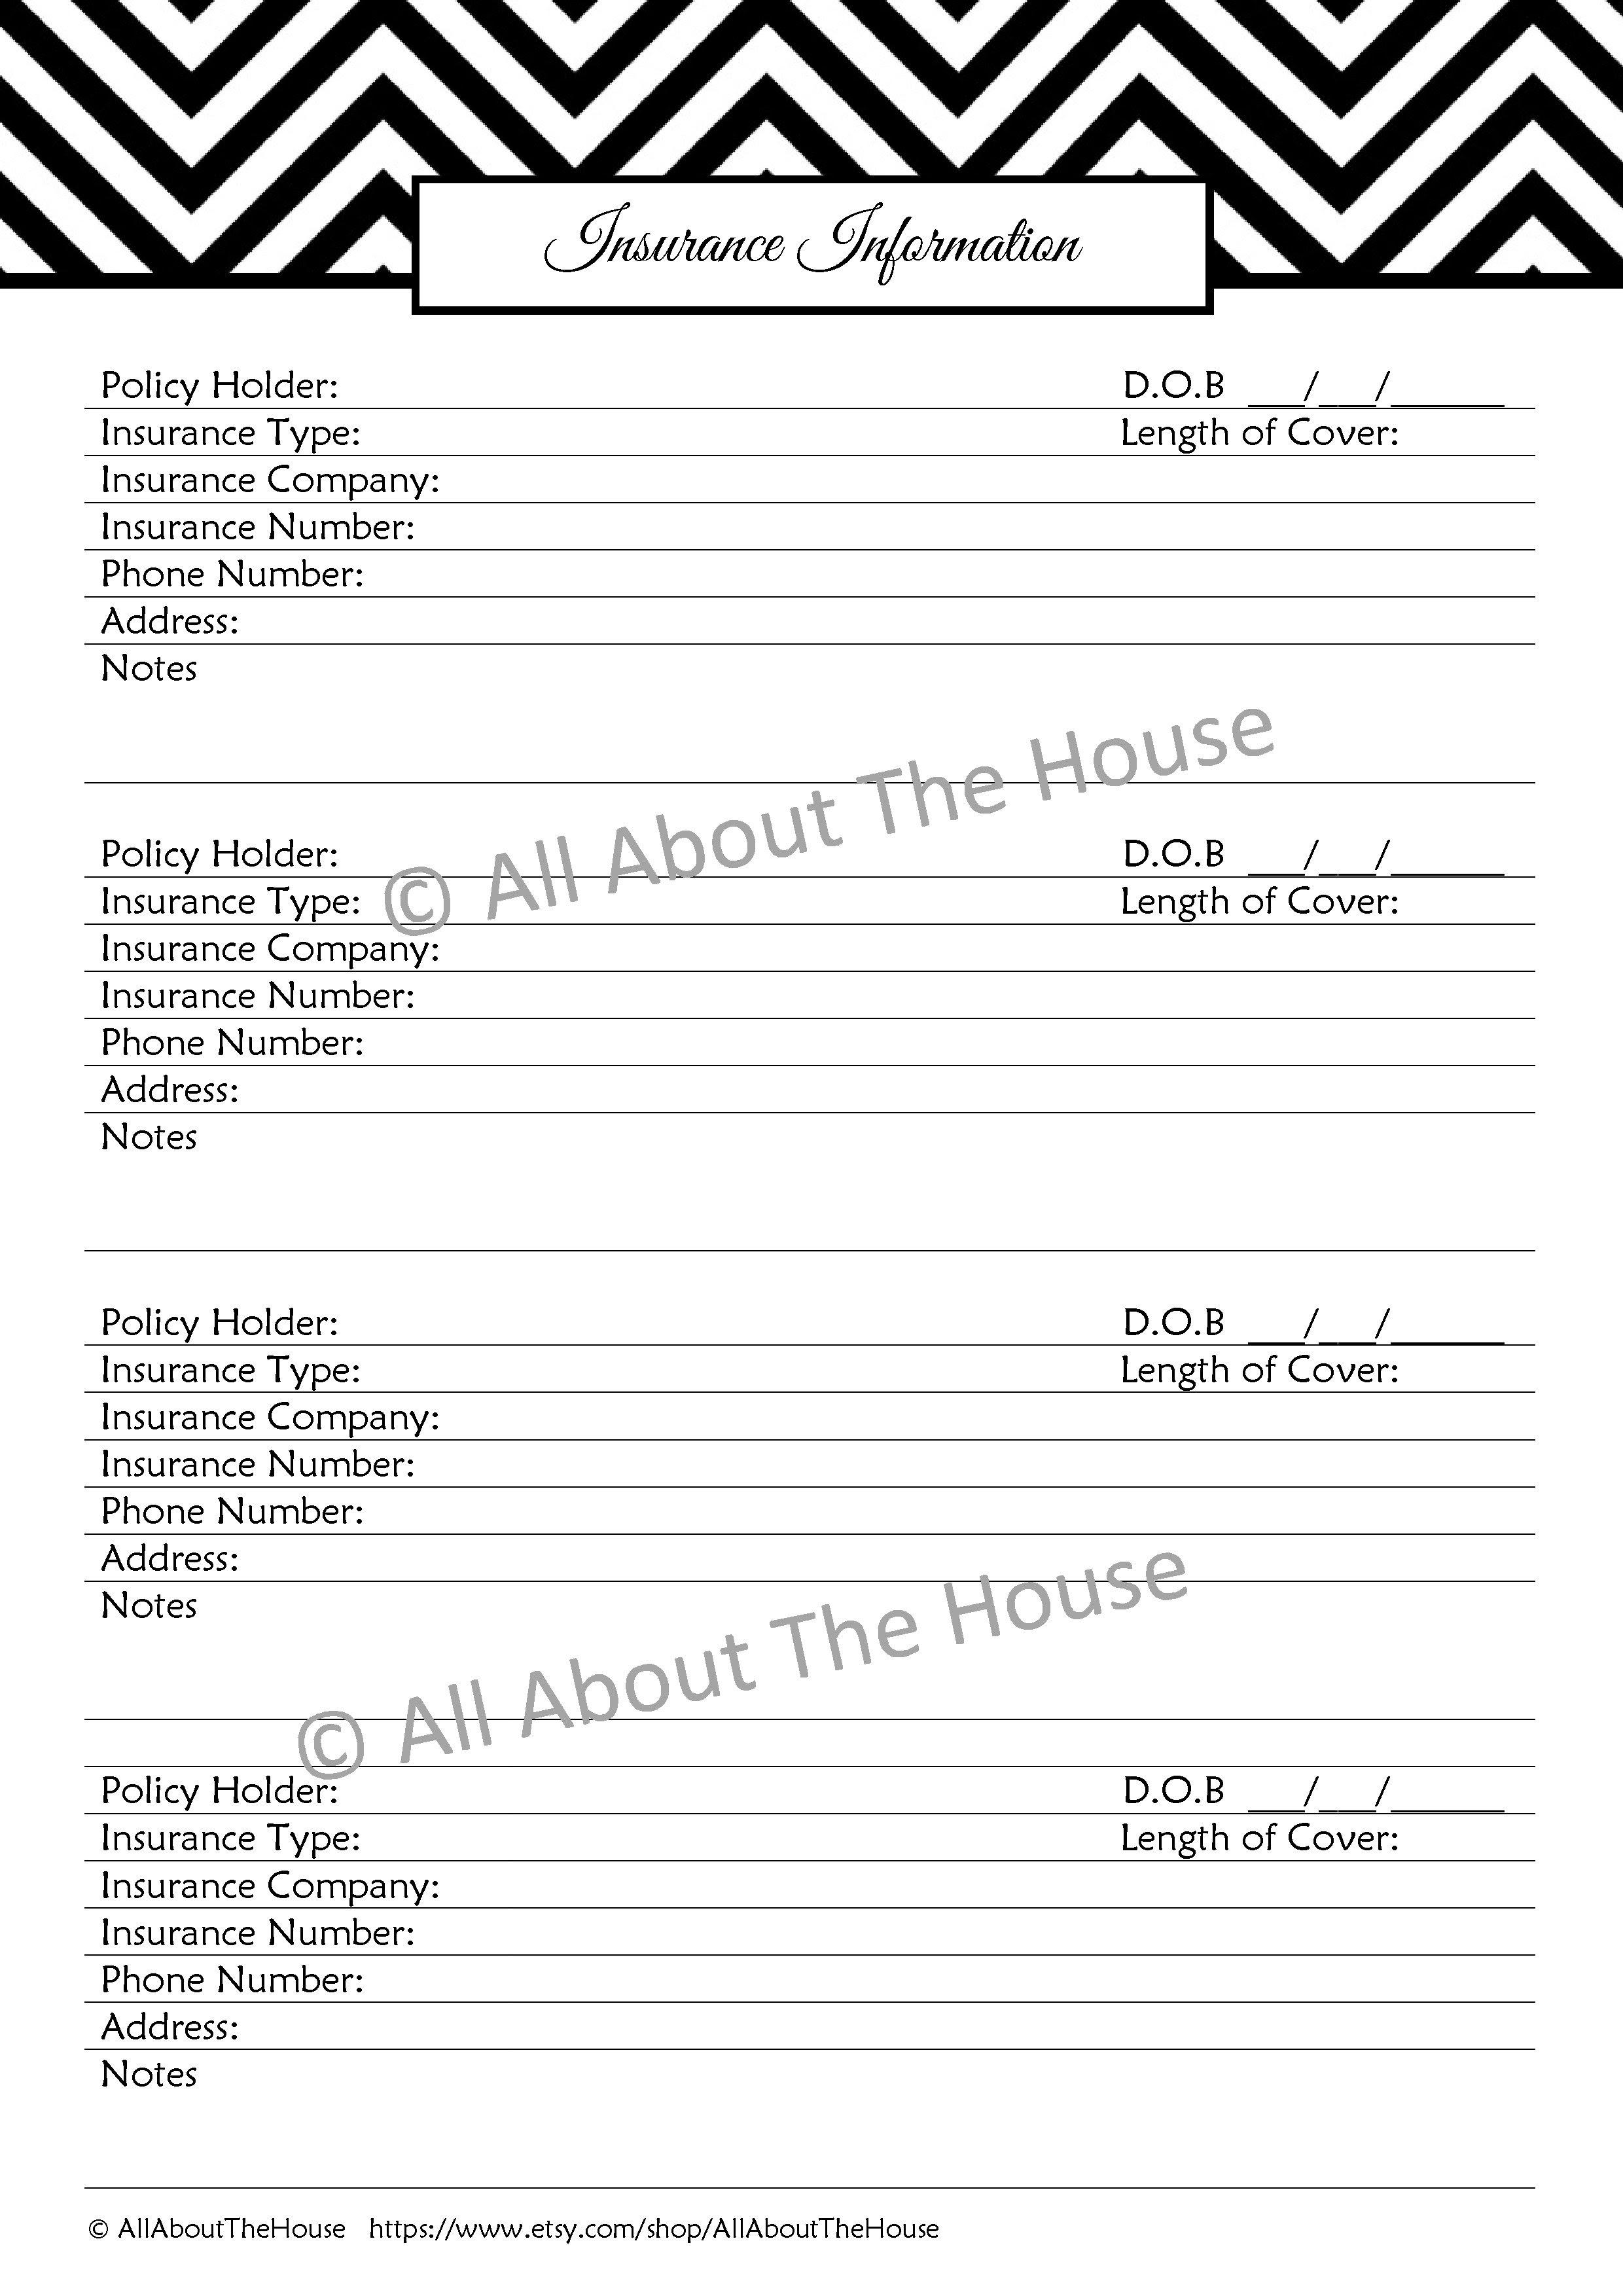 The Important Information Set - Household Binder ...